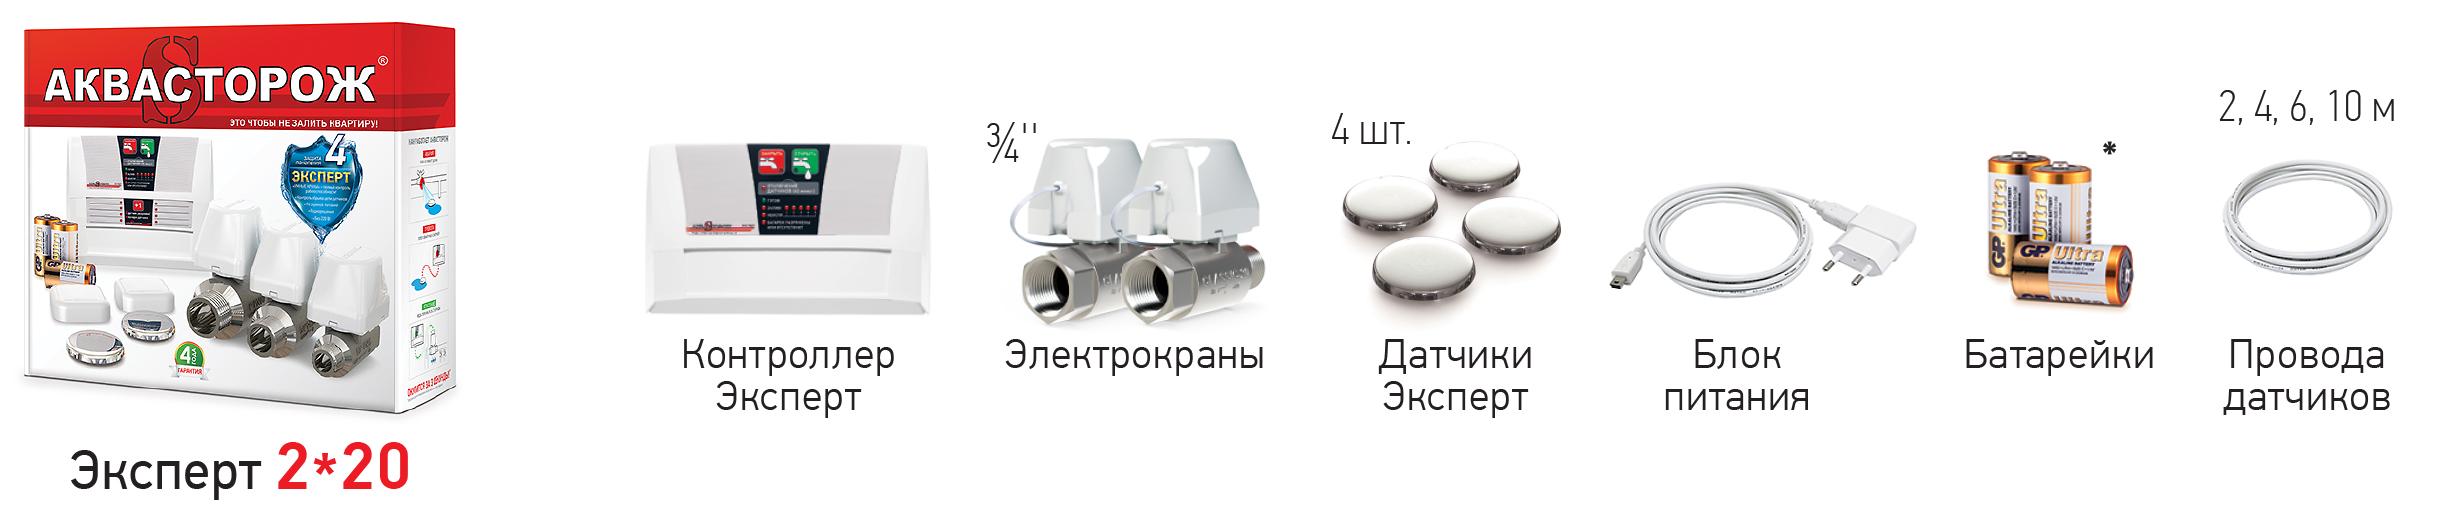 Комплект АКВАСТОРОЖ